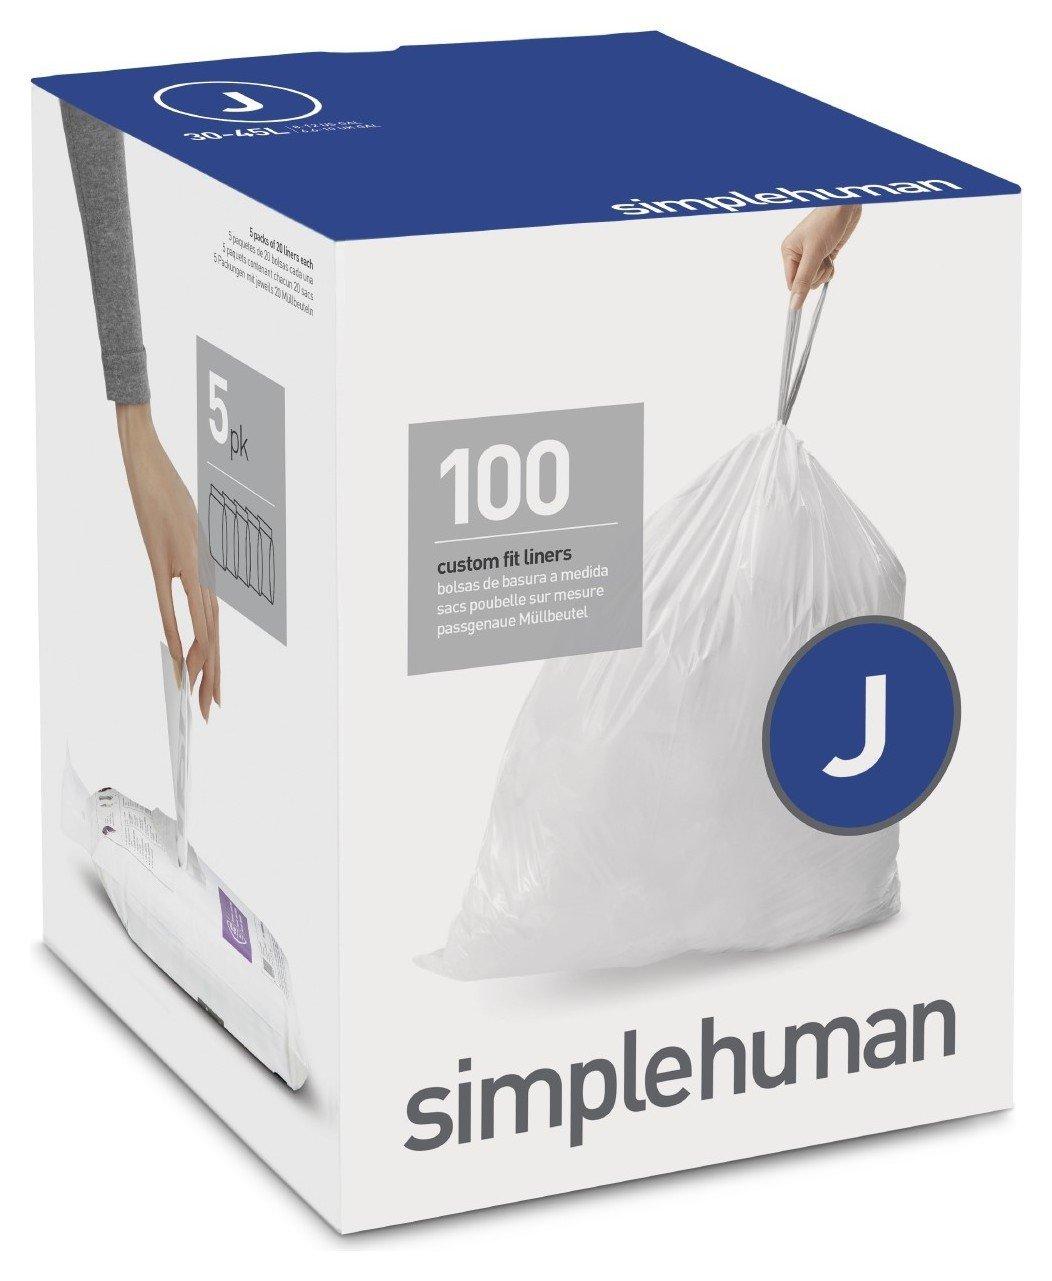 simplehuman Bin Liner Code J x 100 Liners